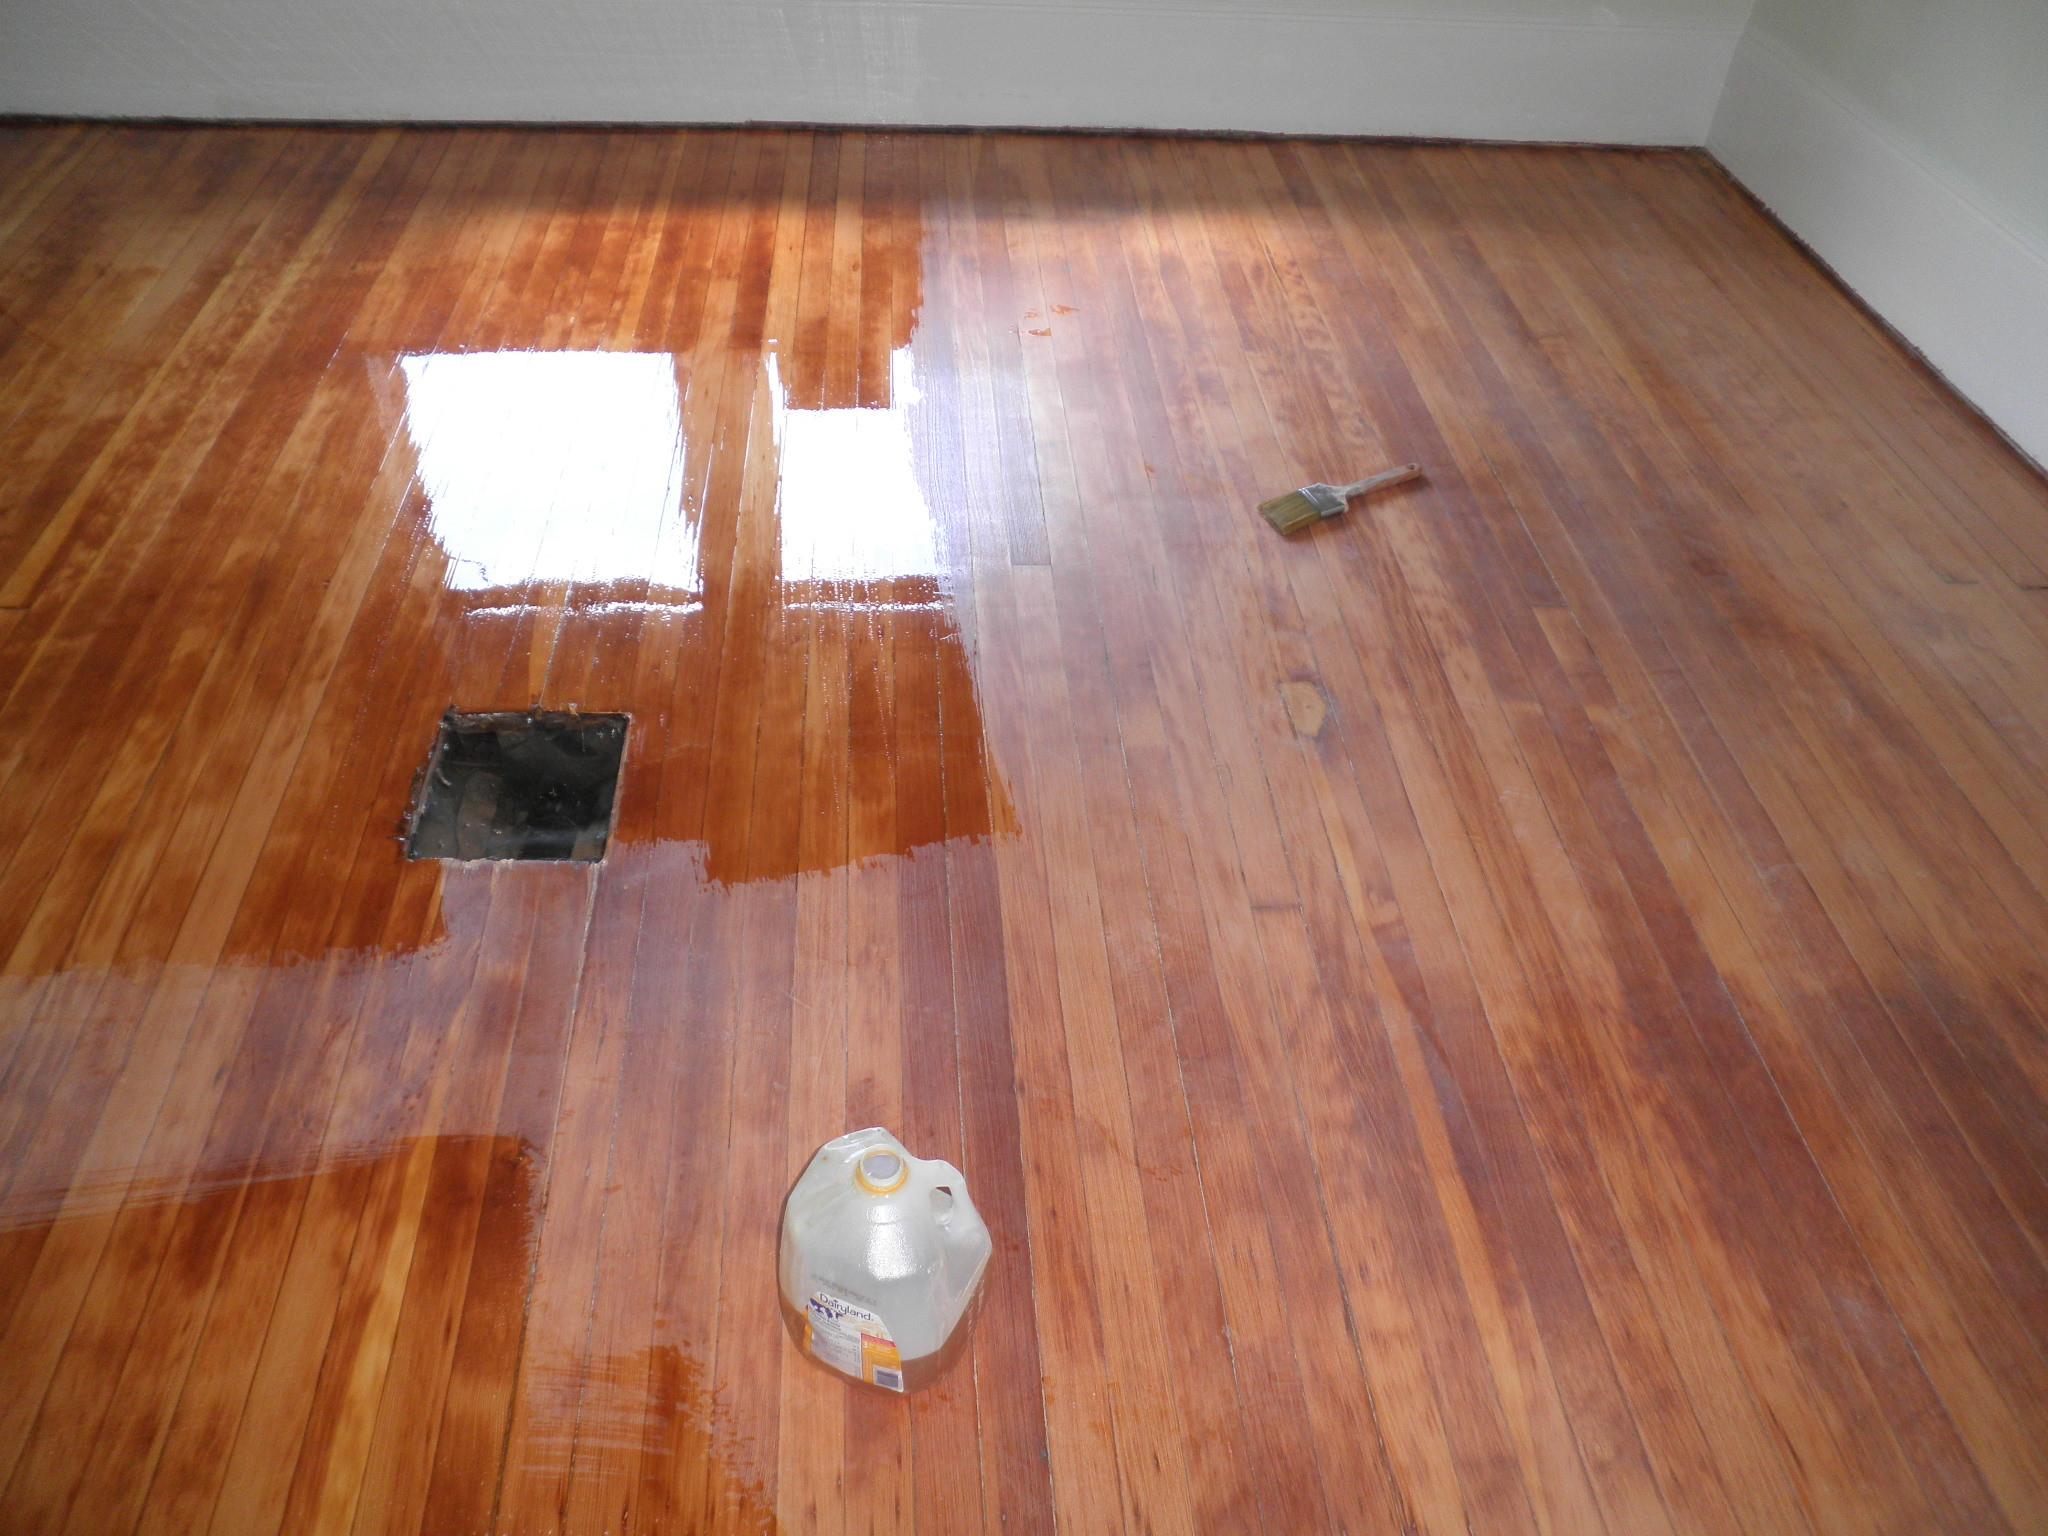 hardwood floor refinishing cleveland of cost to refinish wood floors yourself wikizie co regarding hardwoodors refinishing appealing amazing engineered interior design